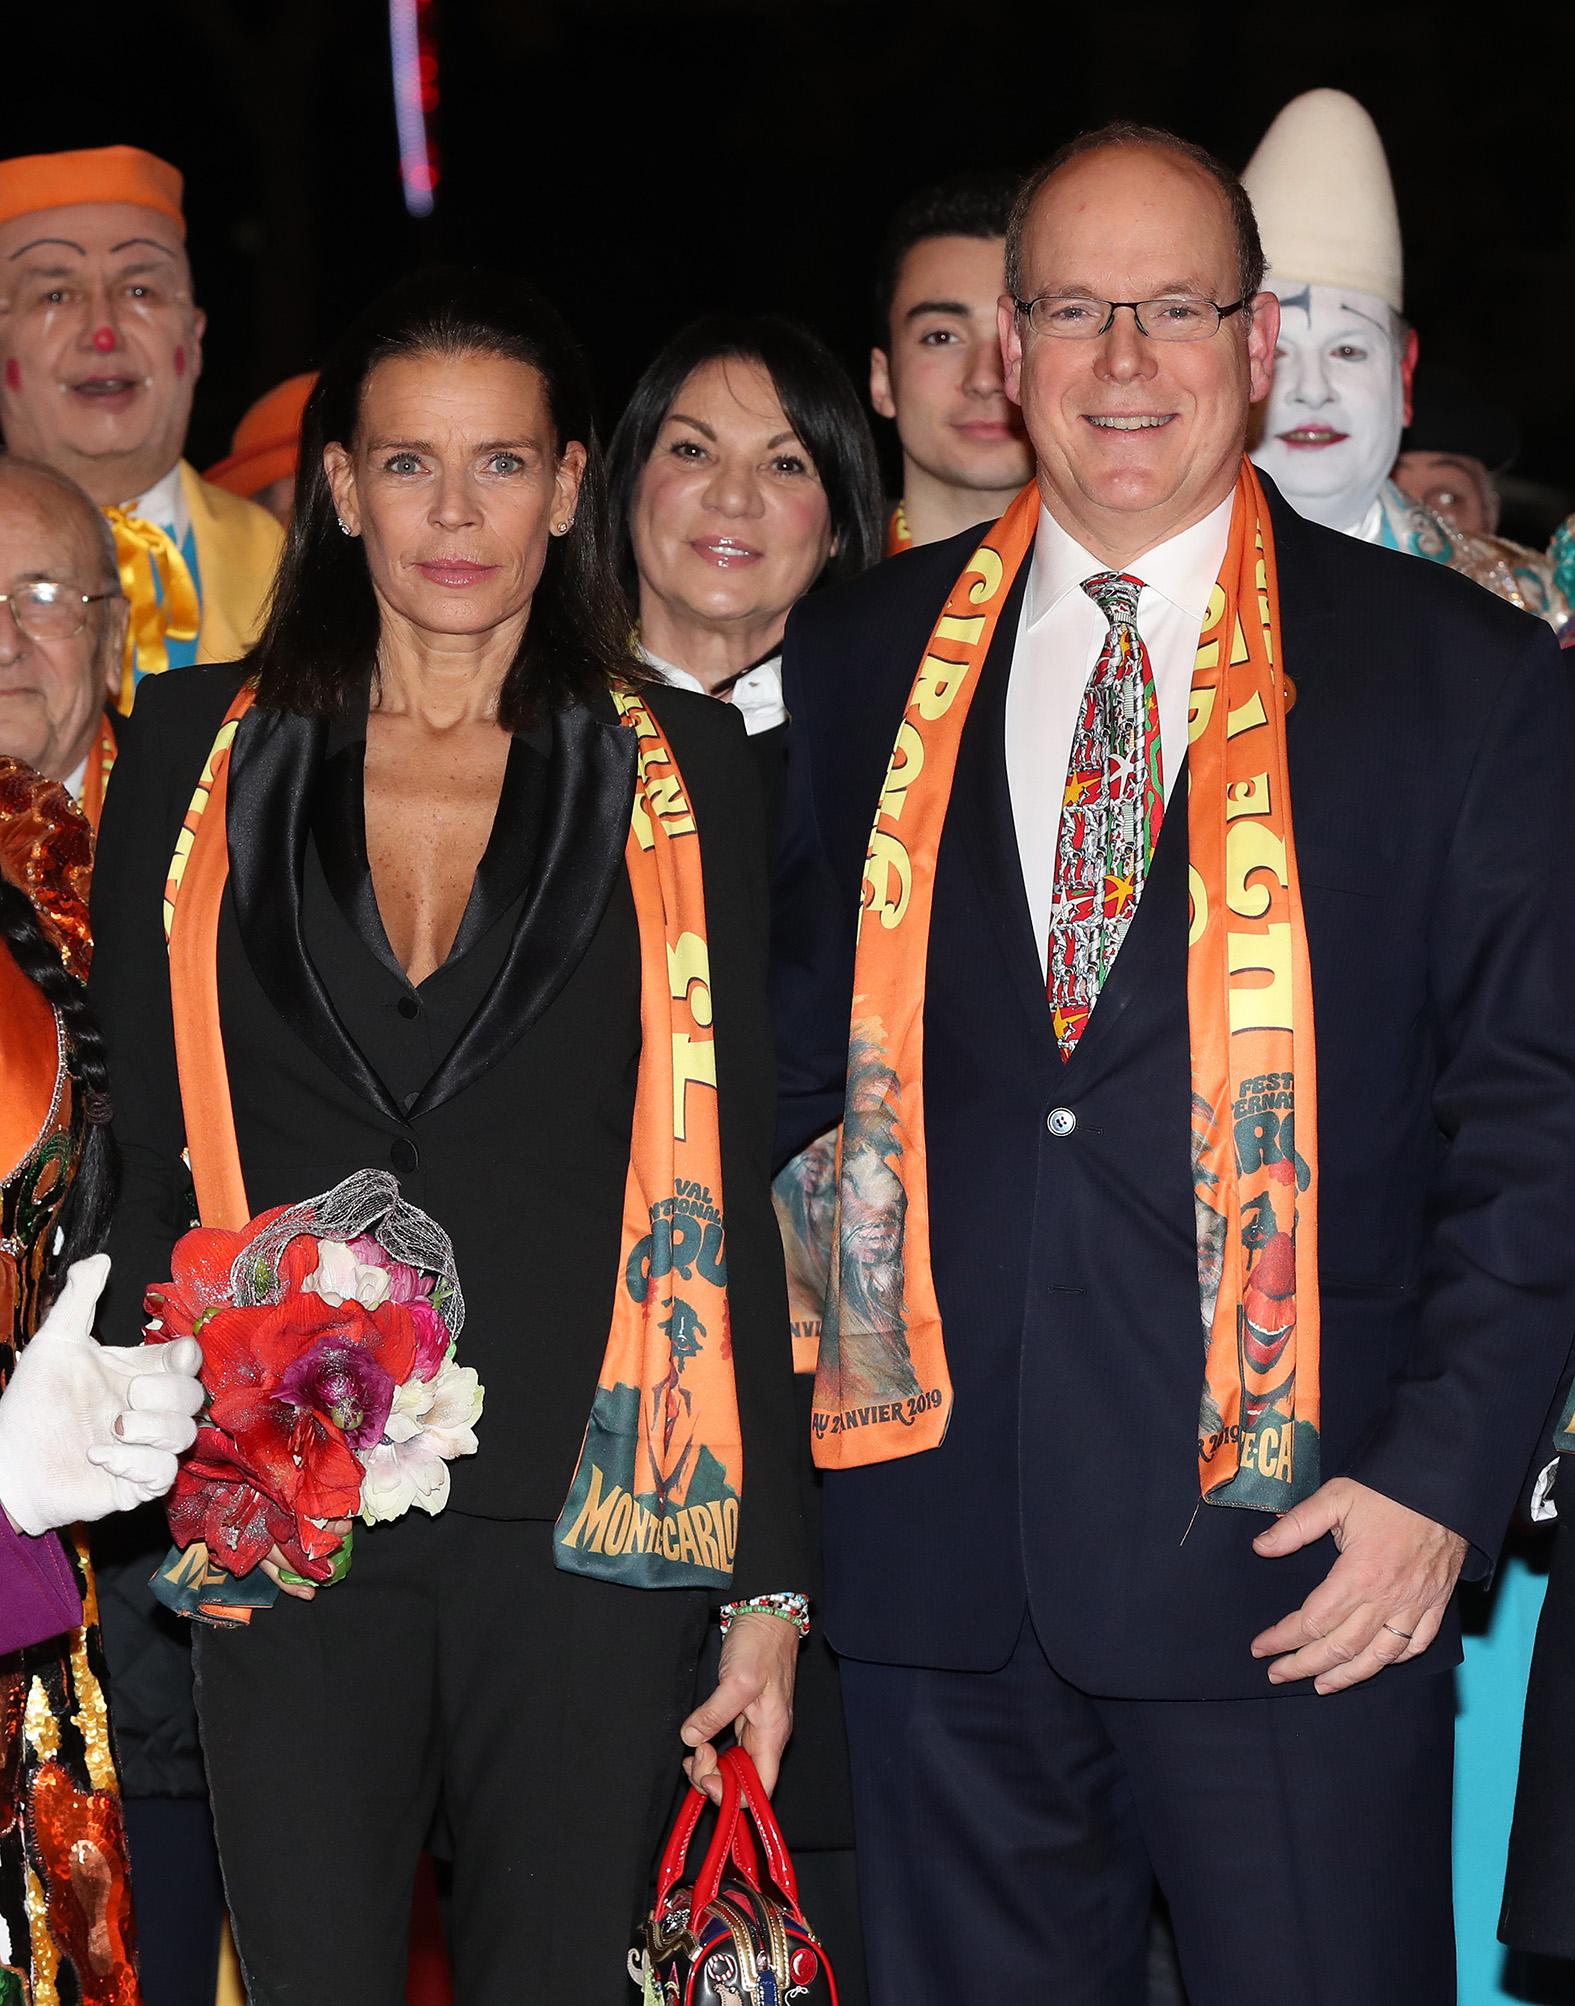 43ème FESTIVAL DE CIRQUE